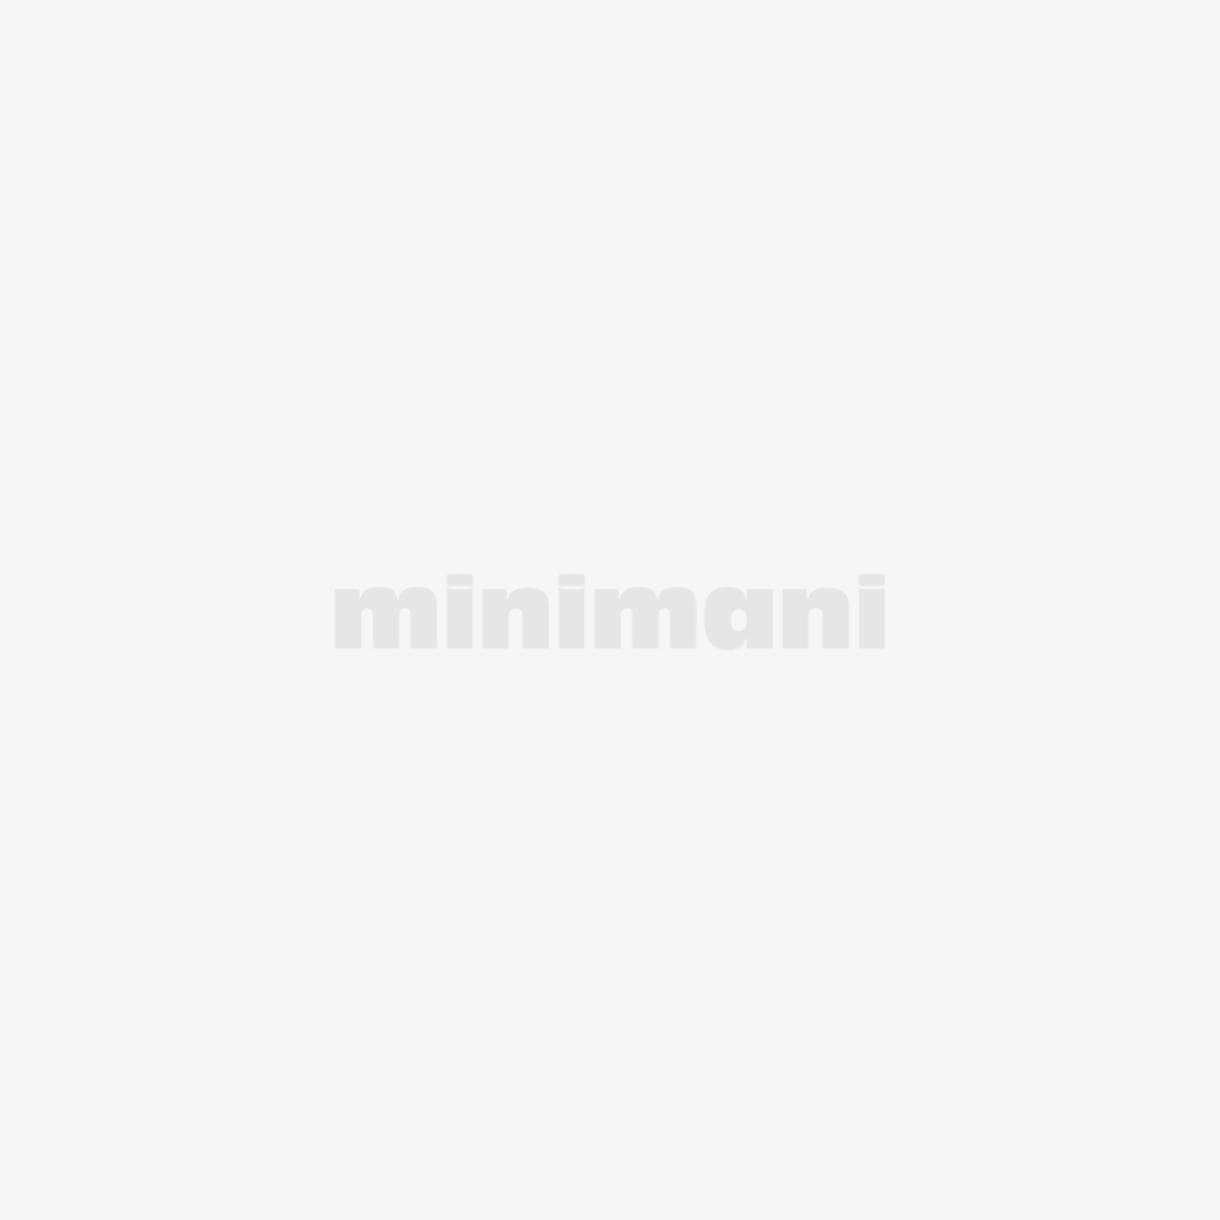 METALTEX FLORENZ SUORAHYLLY 3-OS 30X10X51 CM